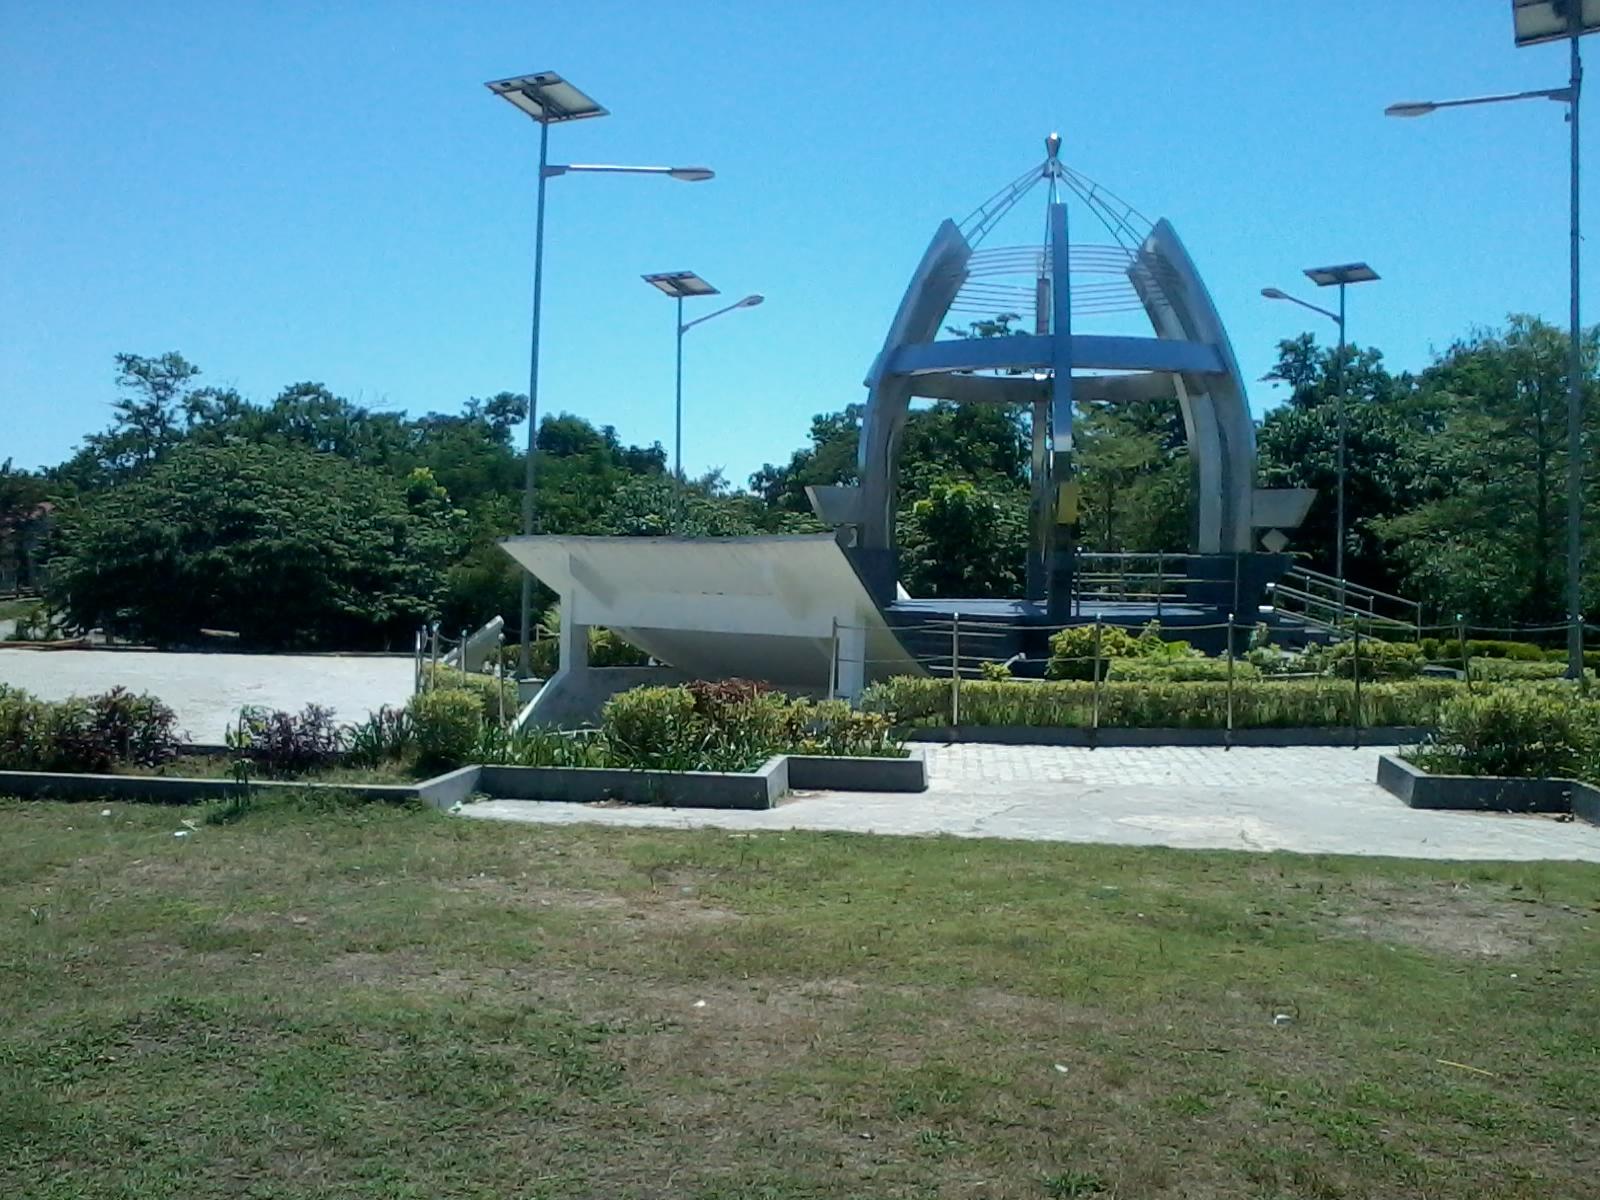 Taman Nostalgia Kota Kupang Haidi Barasa Masjid Raya Nurussaadah Kab